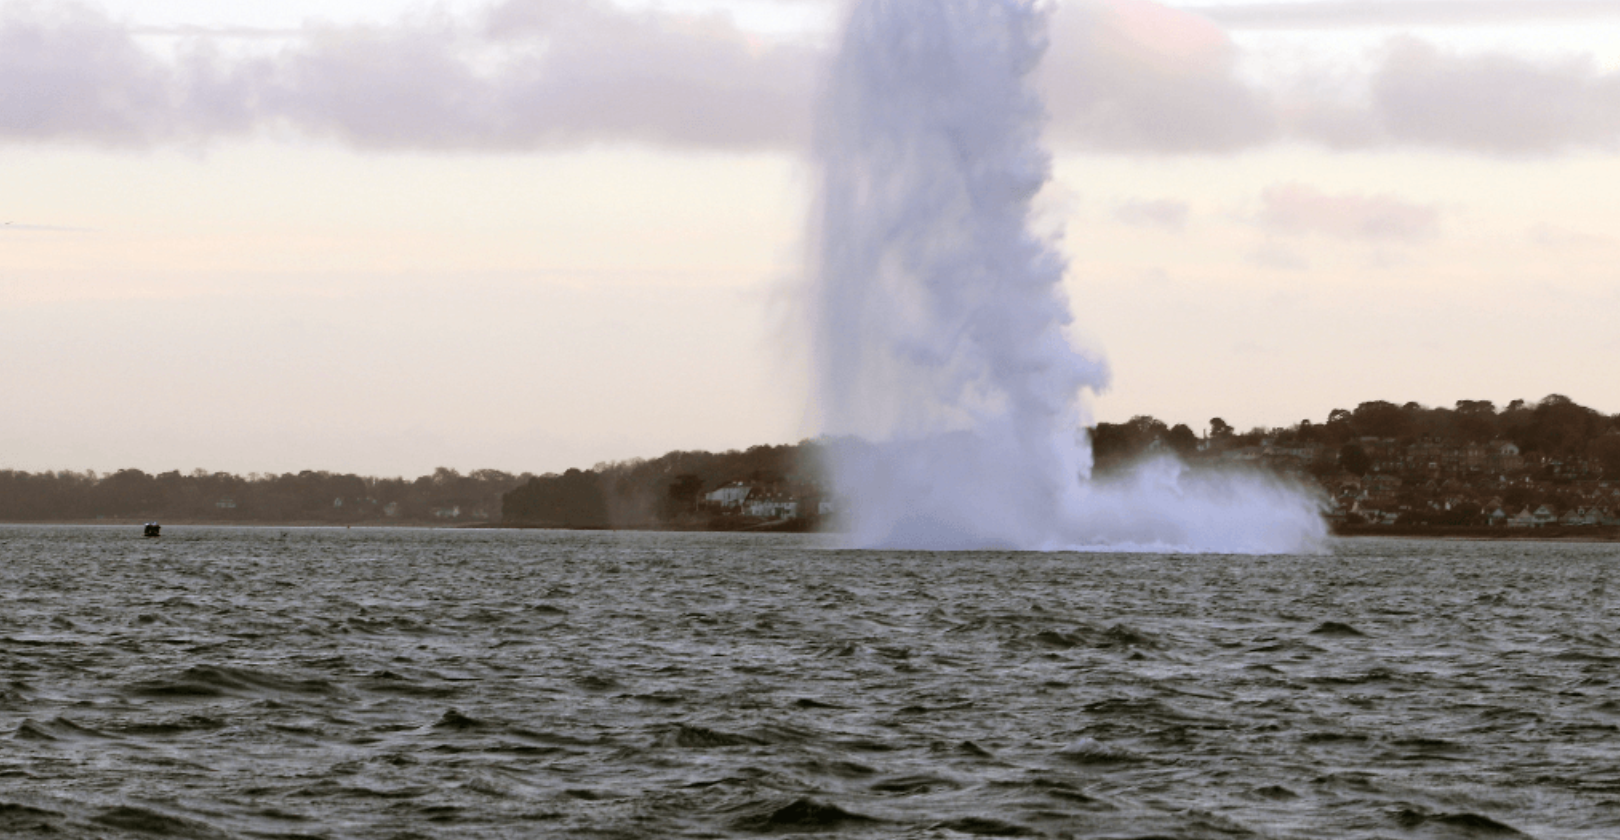 royal navy destroys german bomb portsmouth